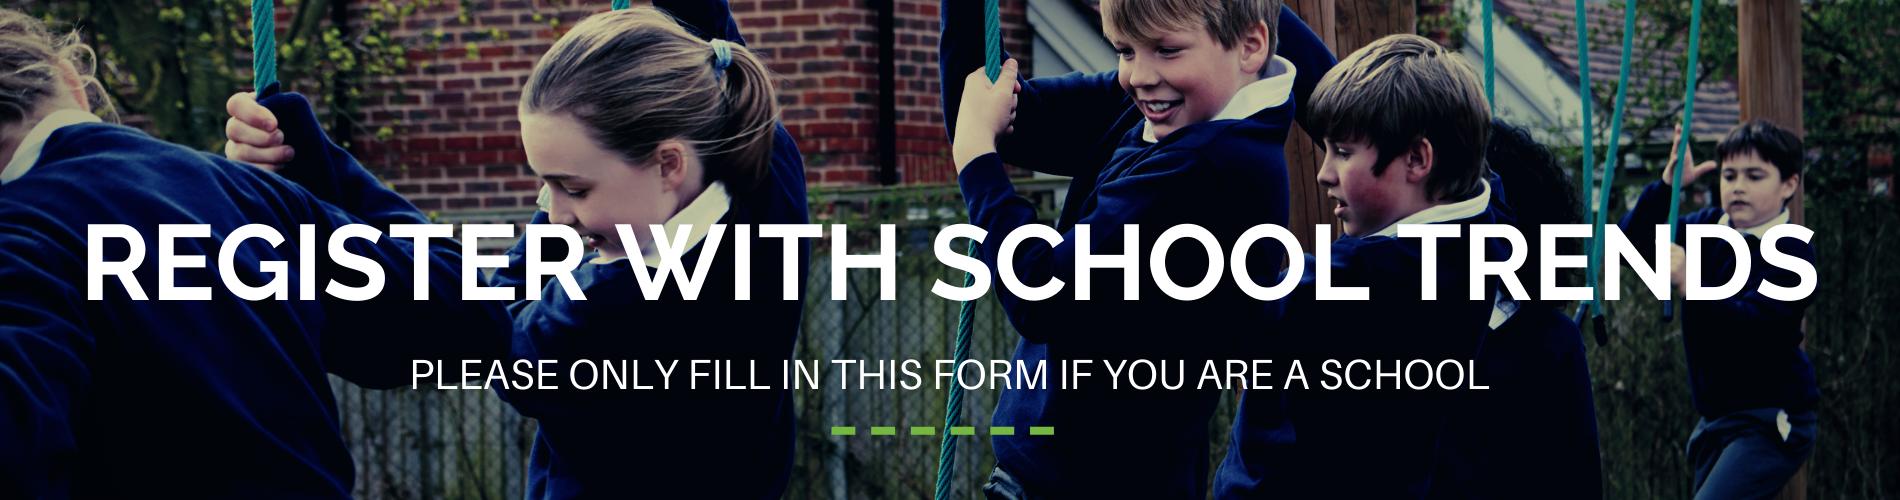 School Uniform delivered to parents and your school | School Trends |